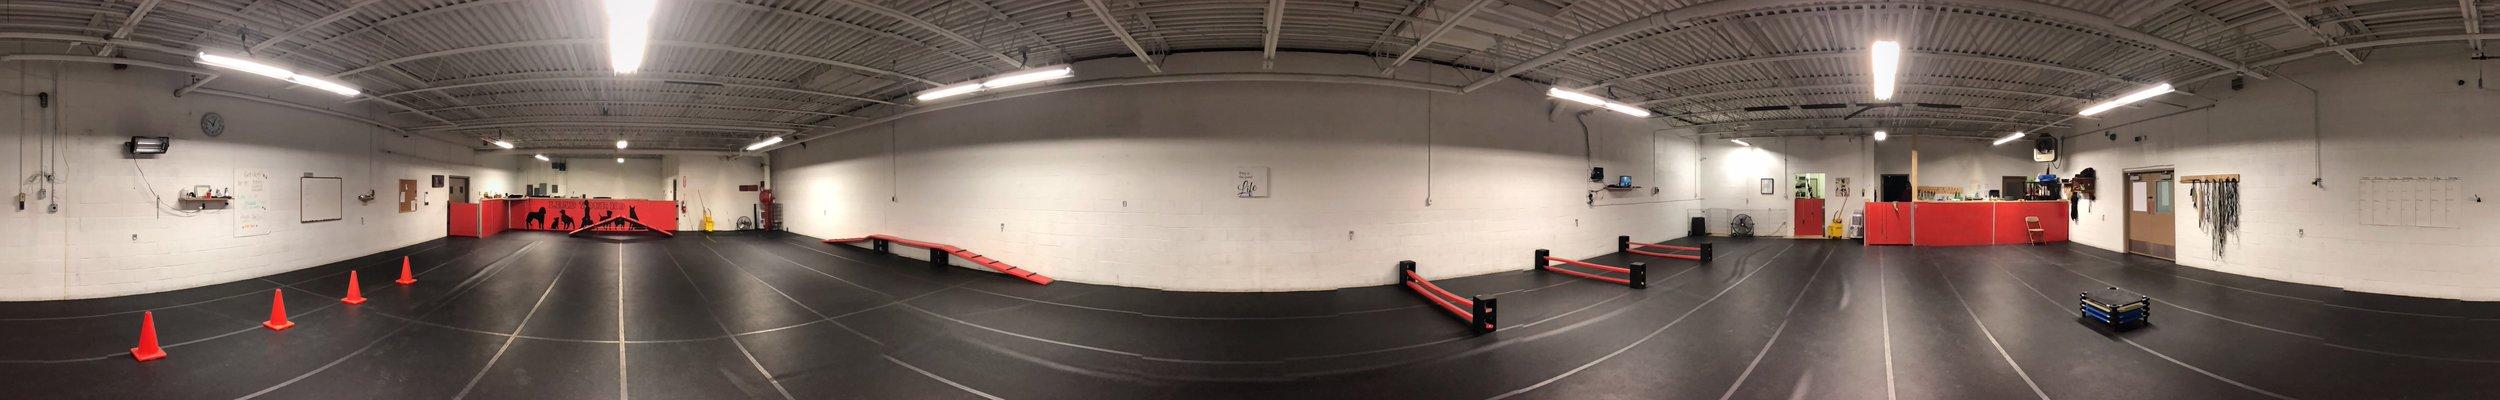 360-degree facility view